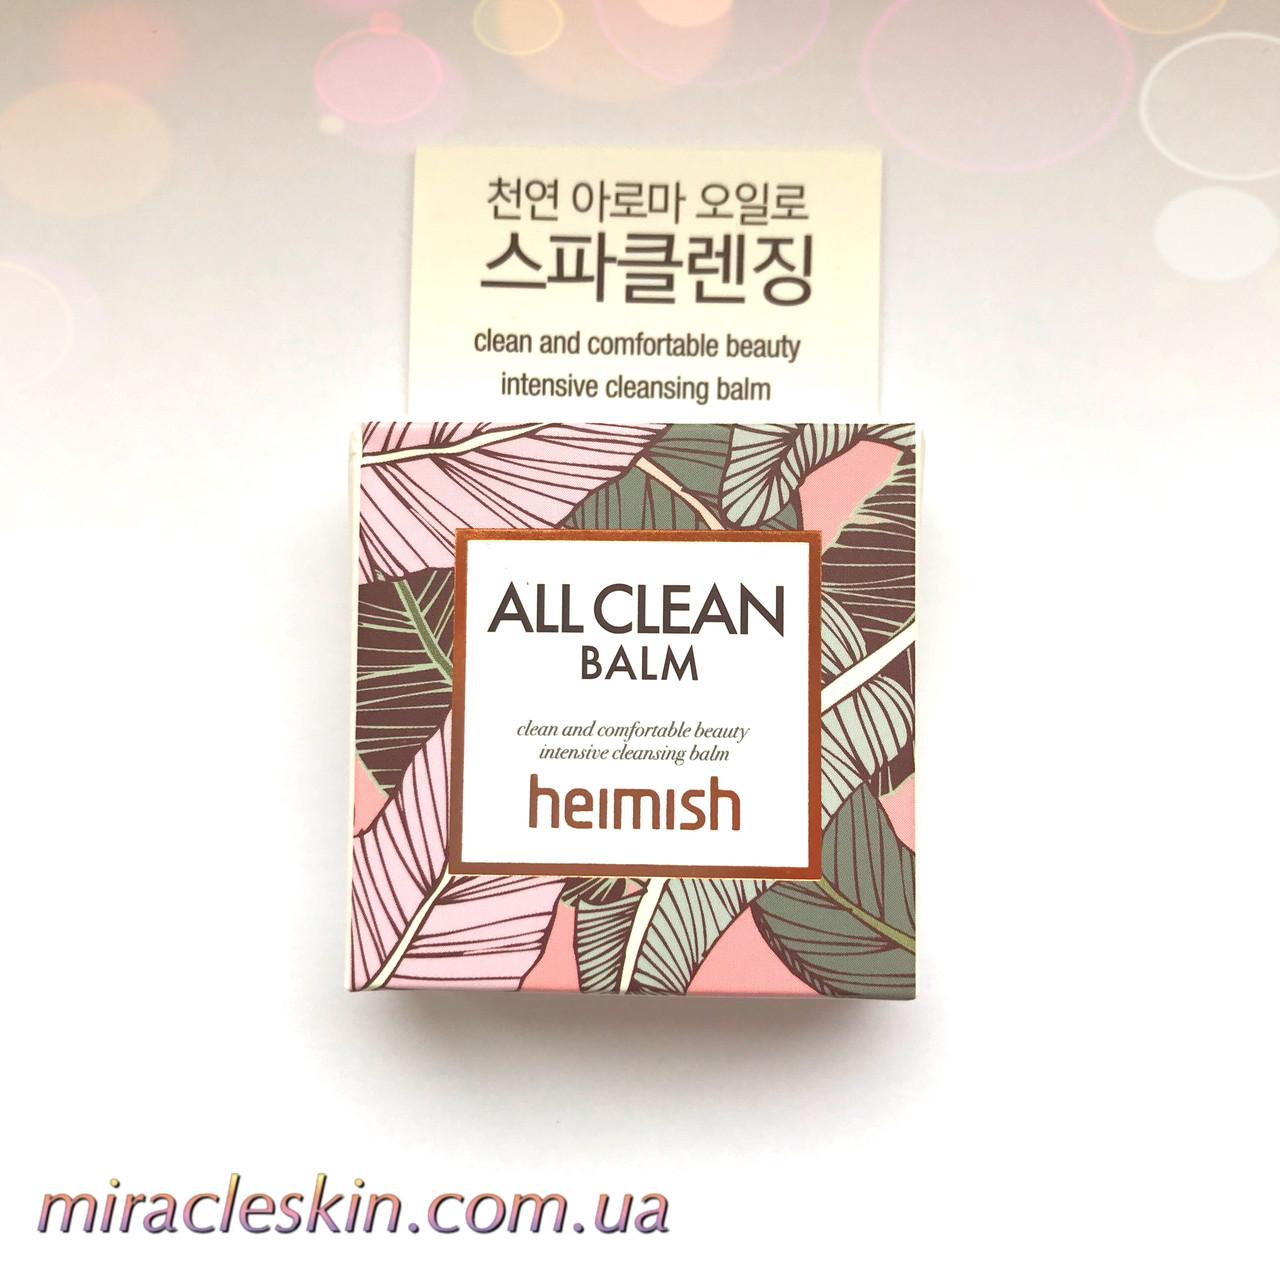 Очищаюший бальзам All Clean Balm Heimish 5ml